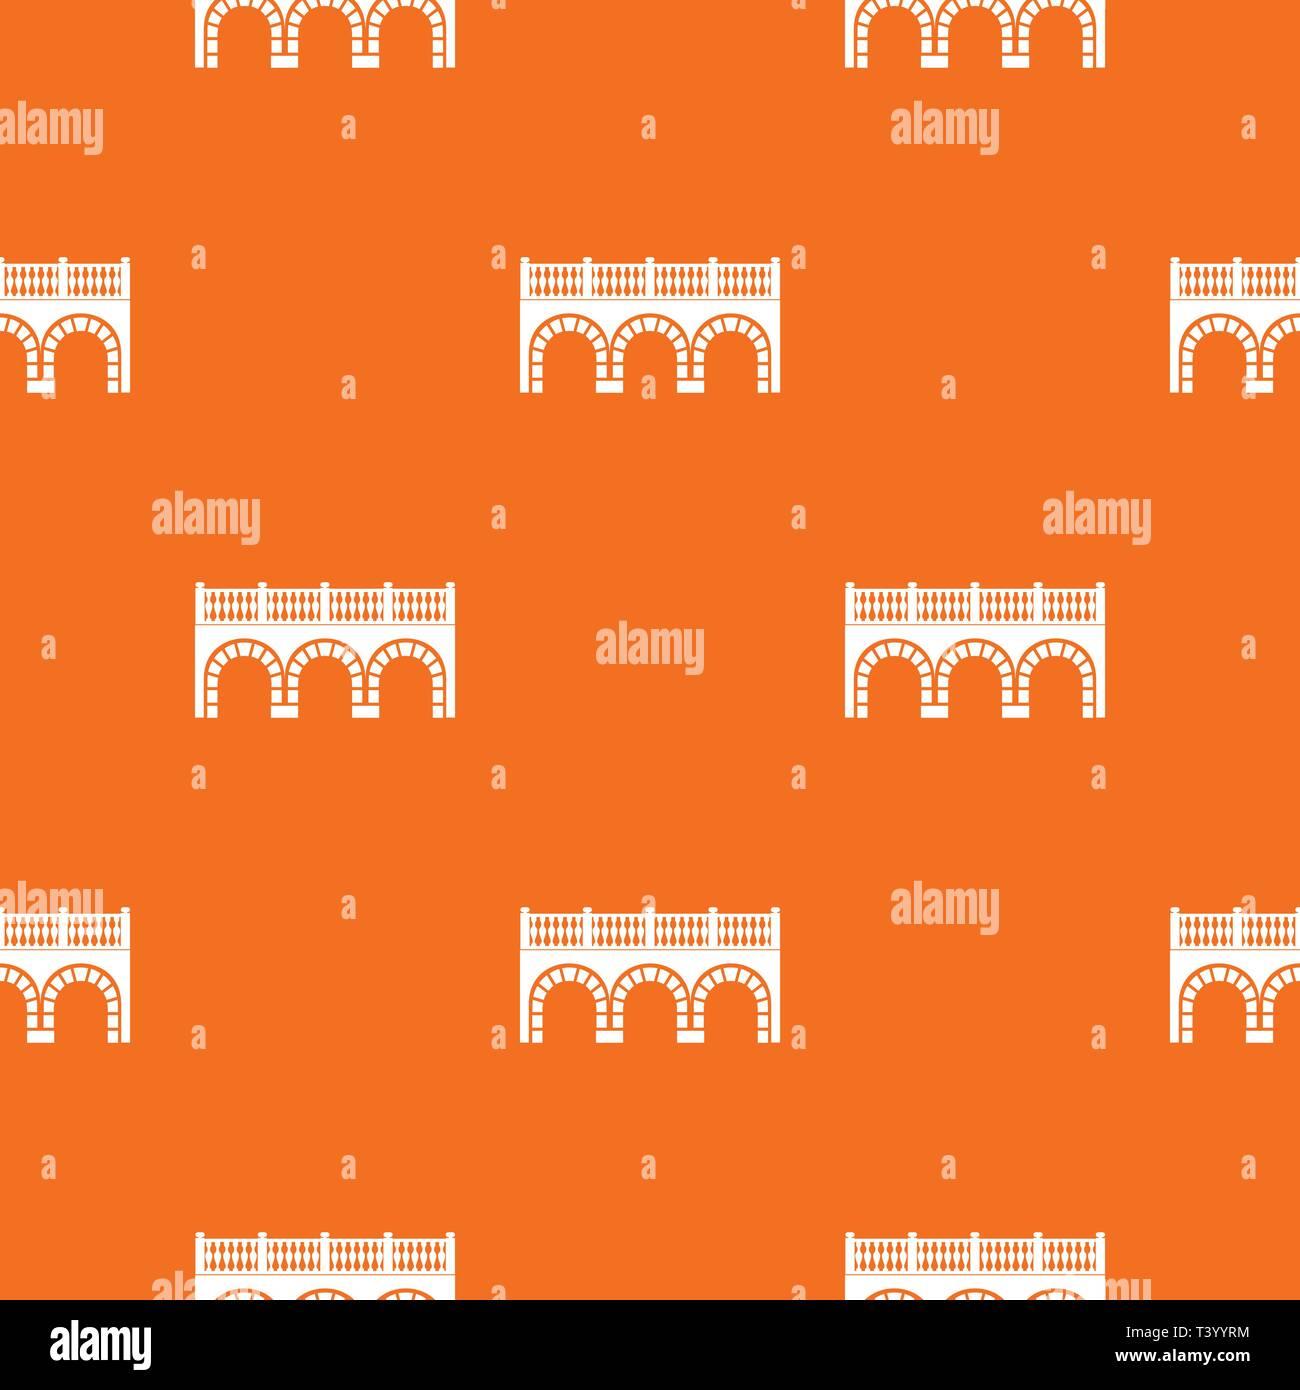 Arch bridge pattern vector orange - Stock Image